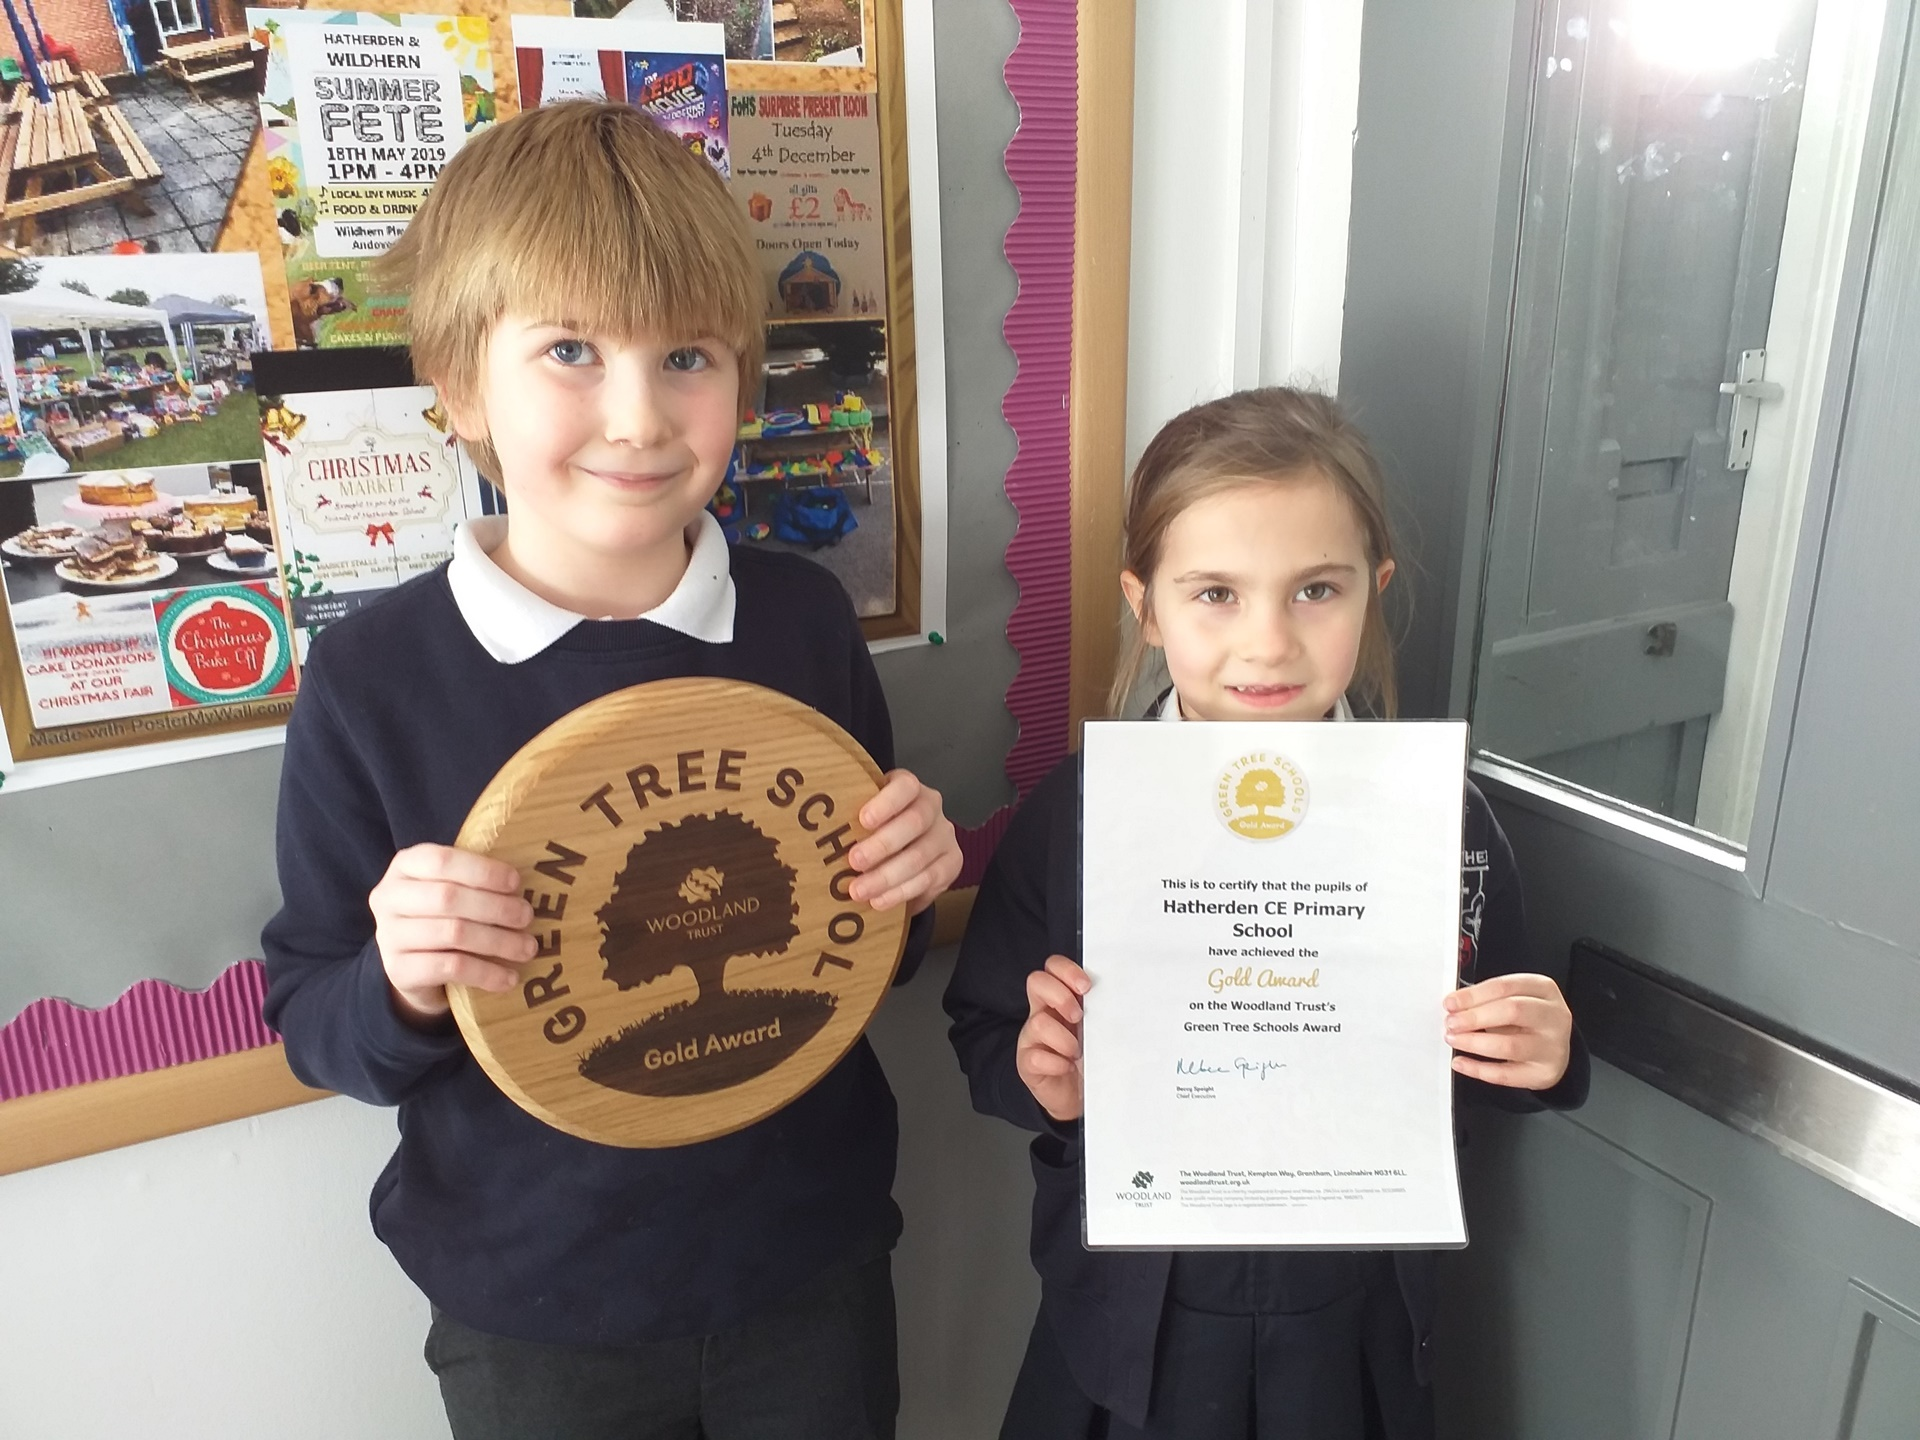 Hatherden CE Primary School Gold Award.